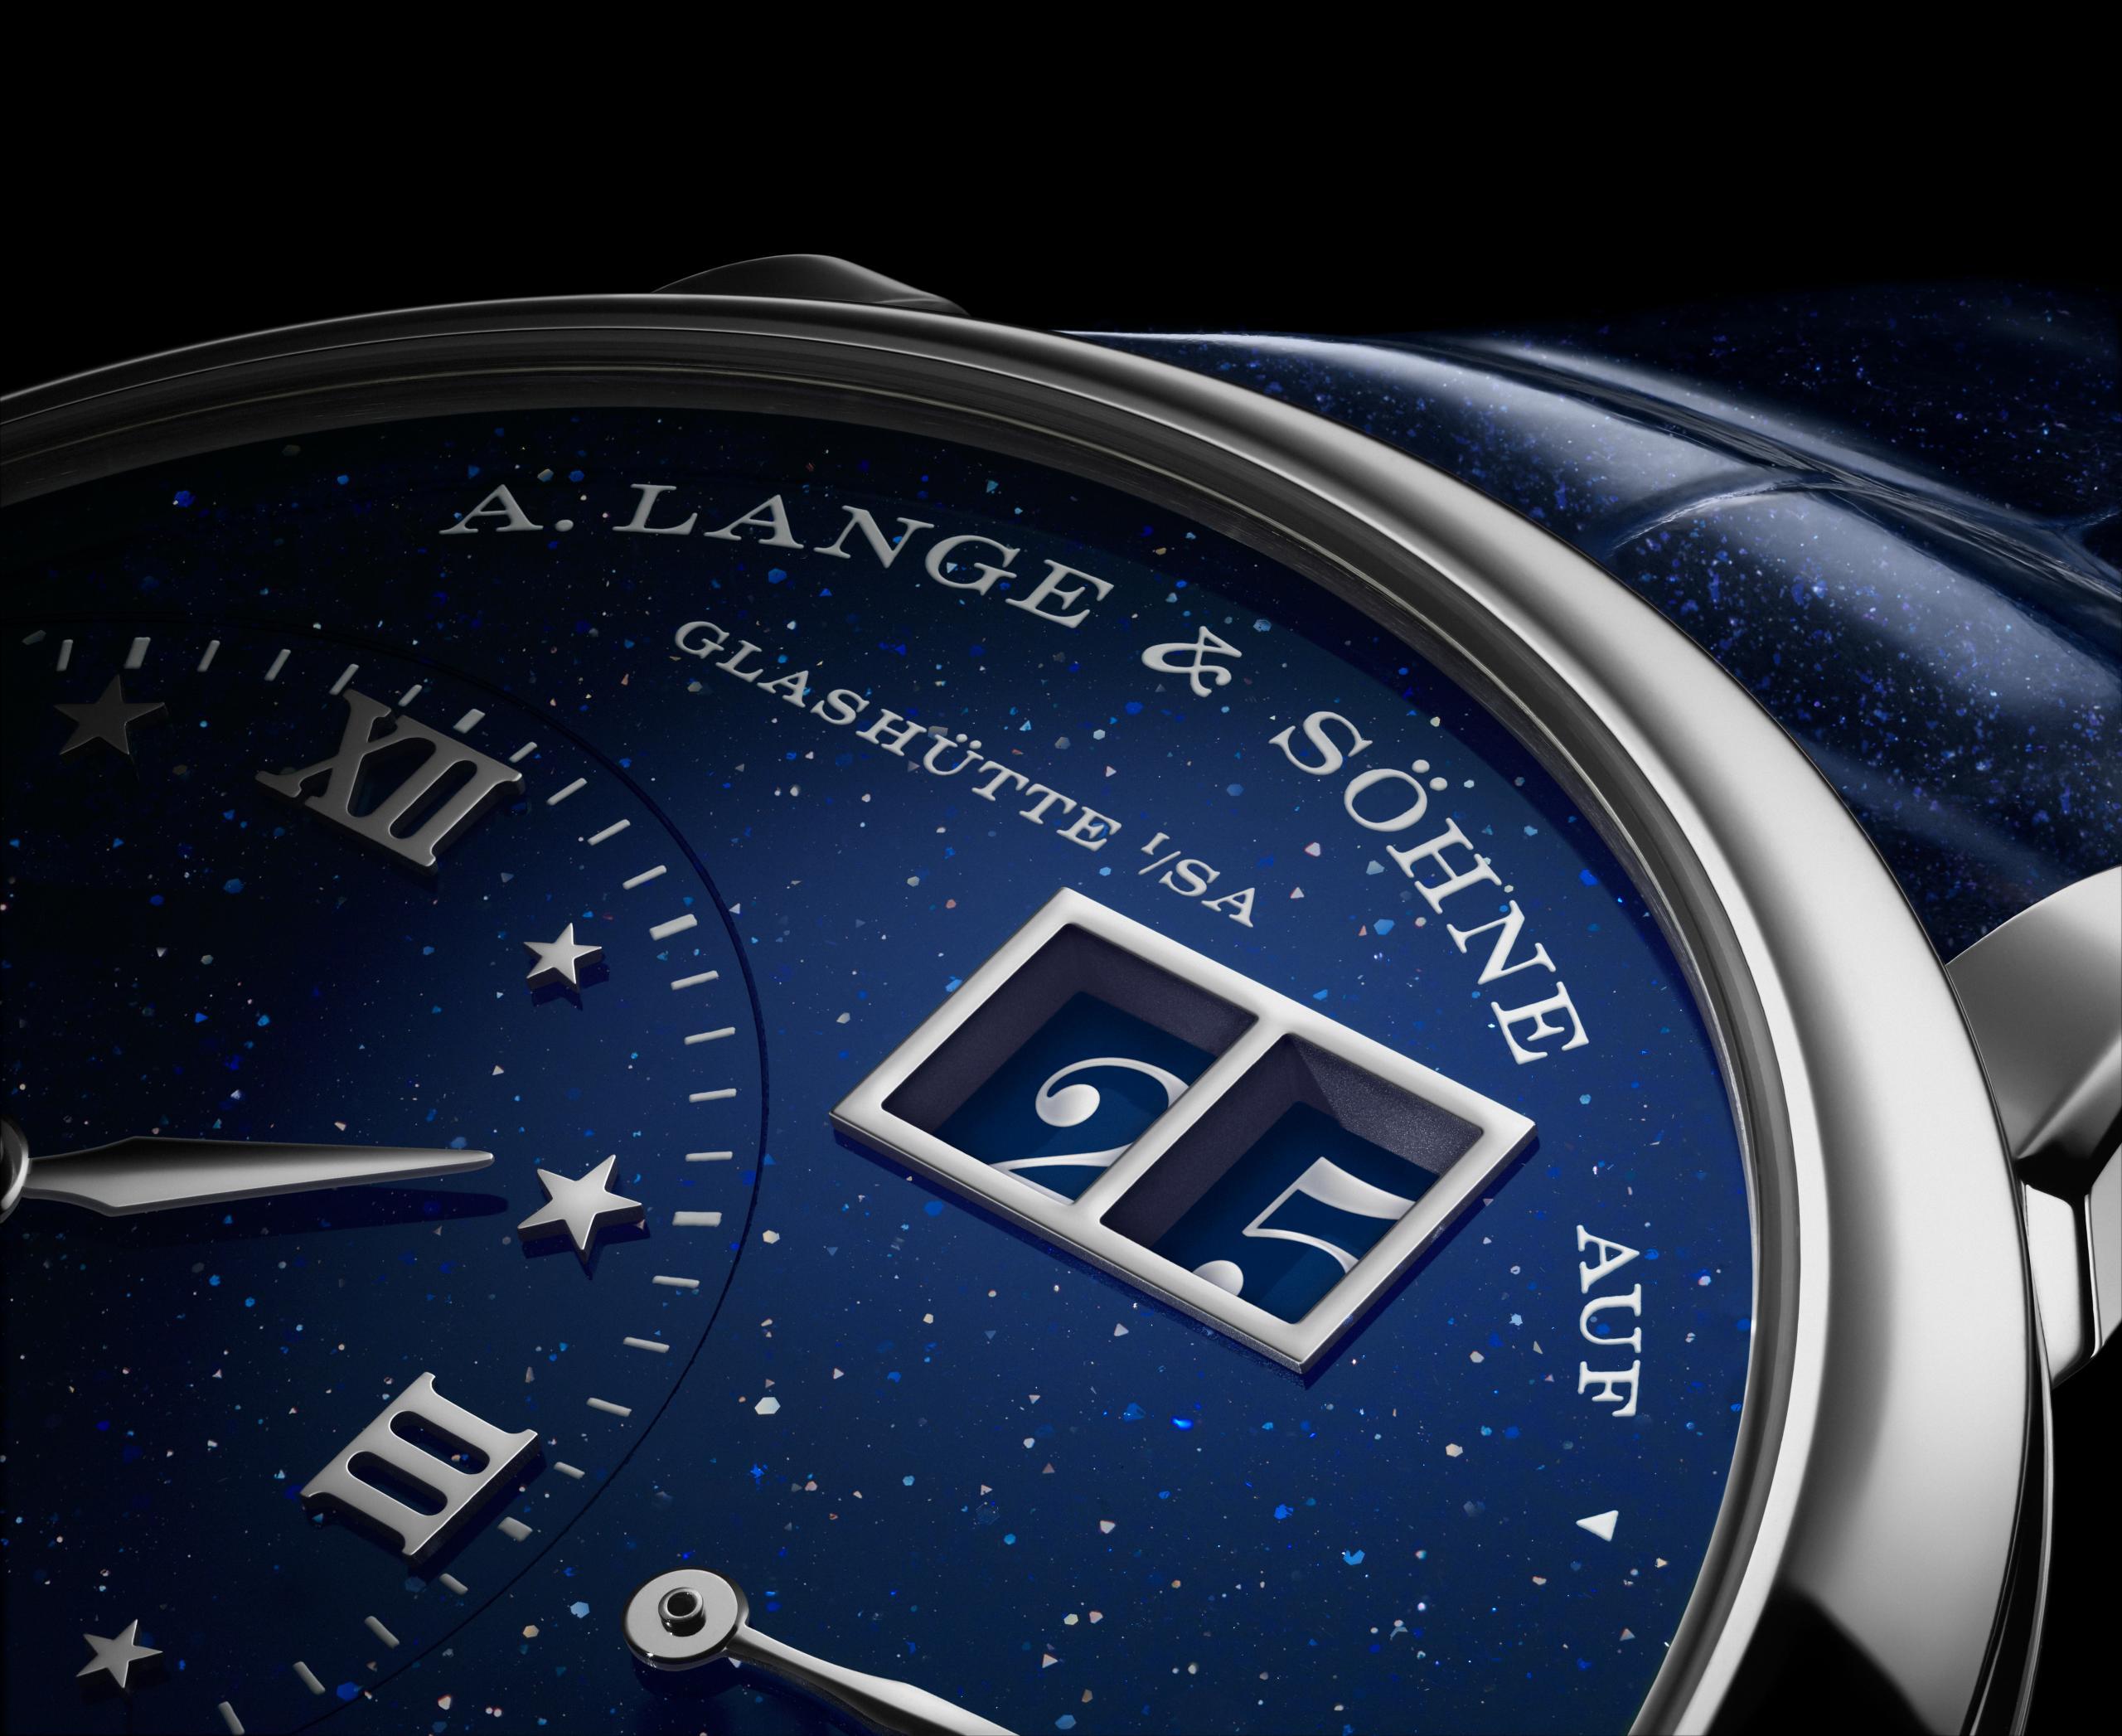 ALS_182_086_B03_Little_Lange1_Moon_Phase_2021_2145833